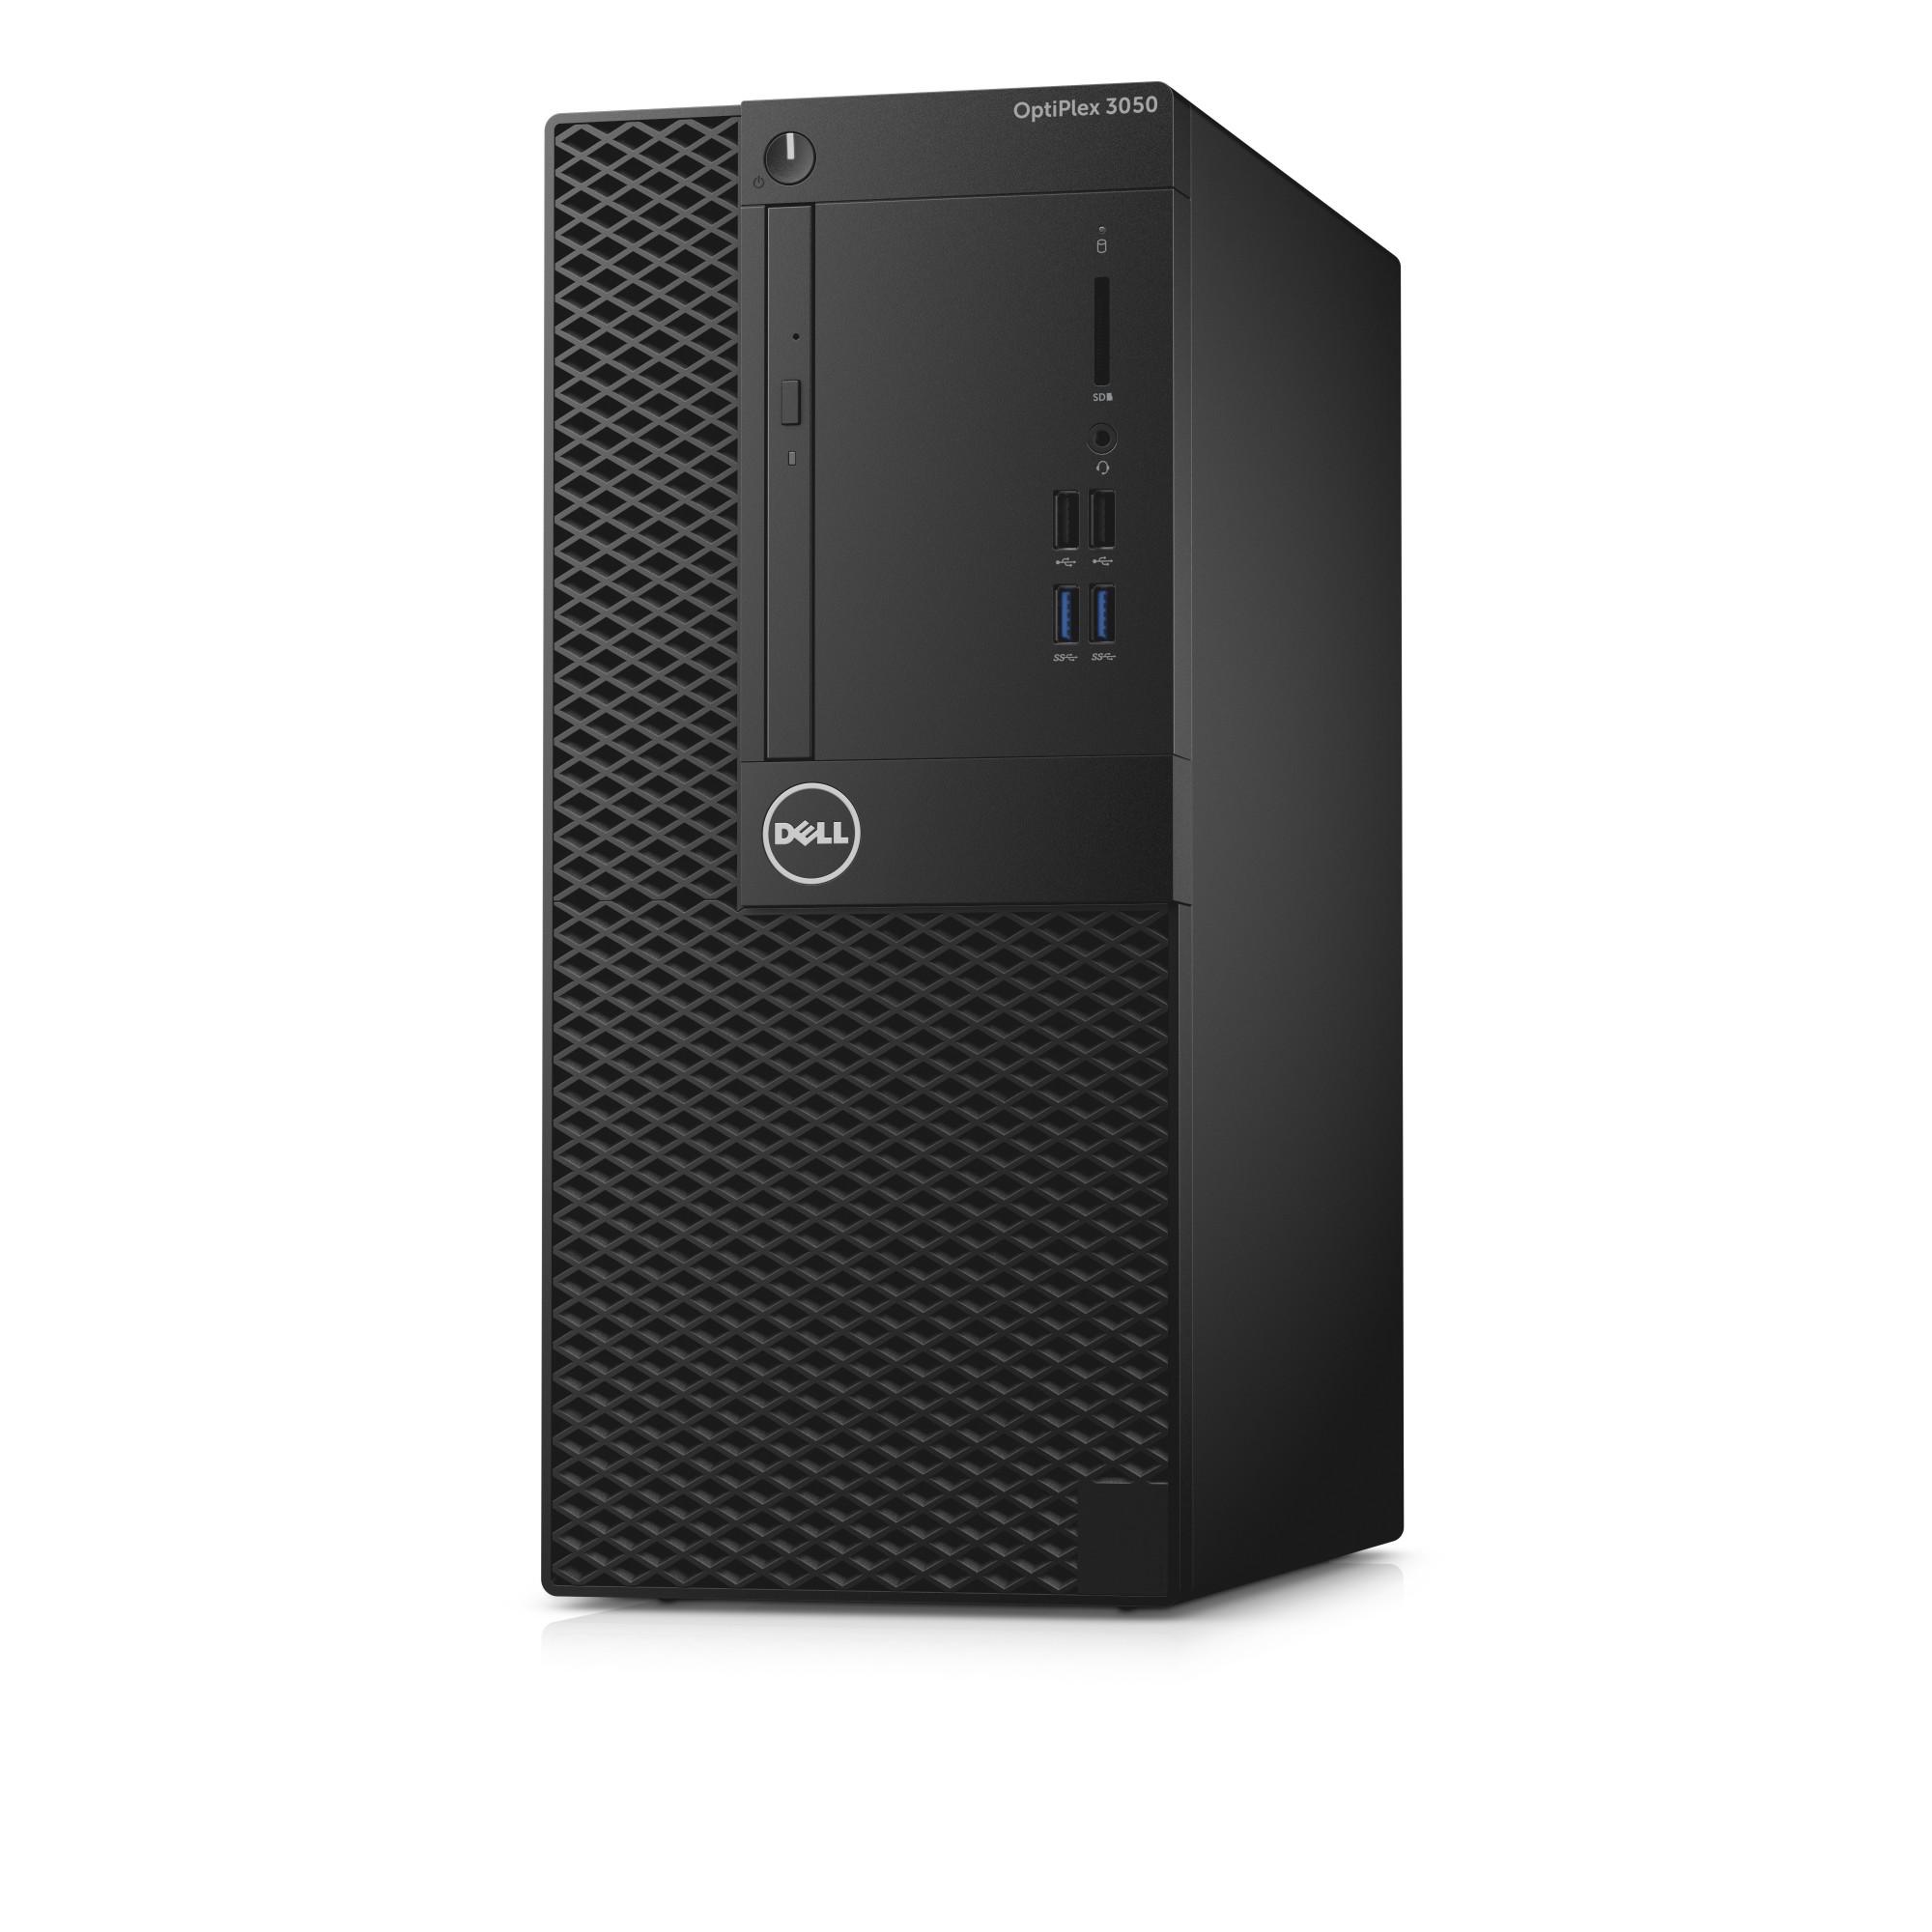 DELL OptiPlex 3050 3.9GHz i3-7100 Mini Tower Black PC